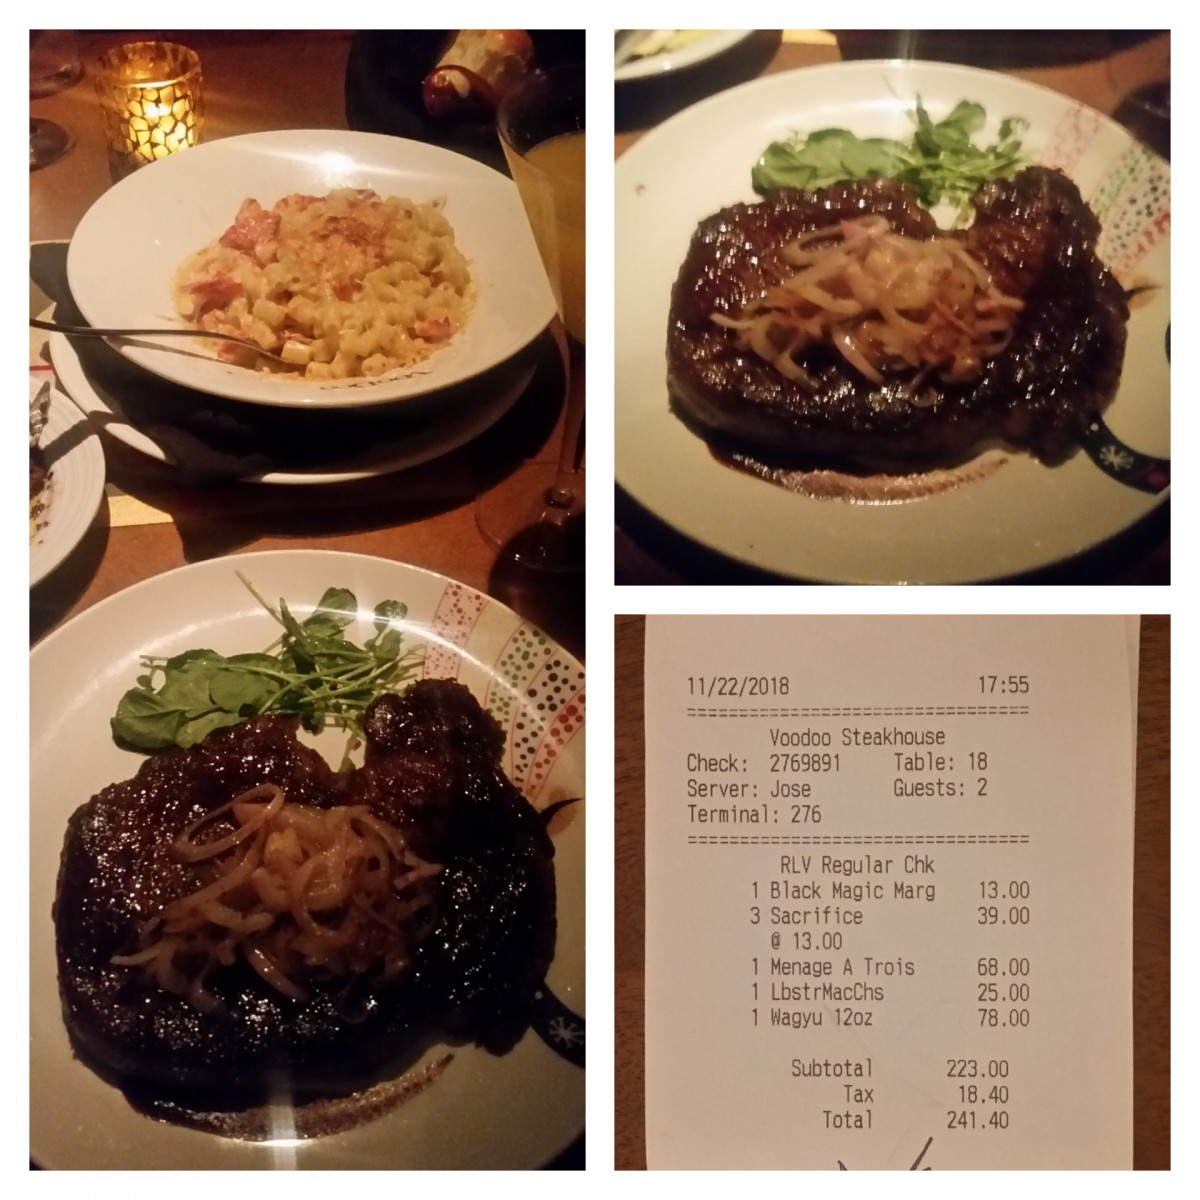 Voodoo Steakhouse, 3700 W Flamingo Road, Las Vegas, 89103